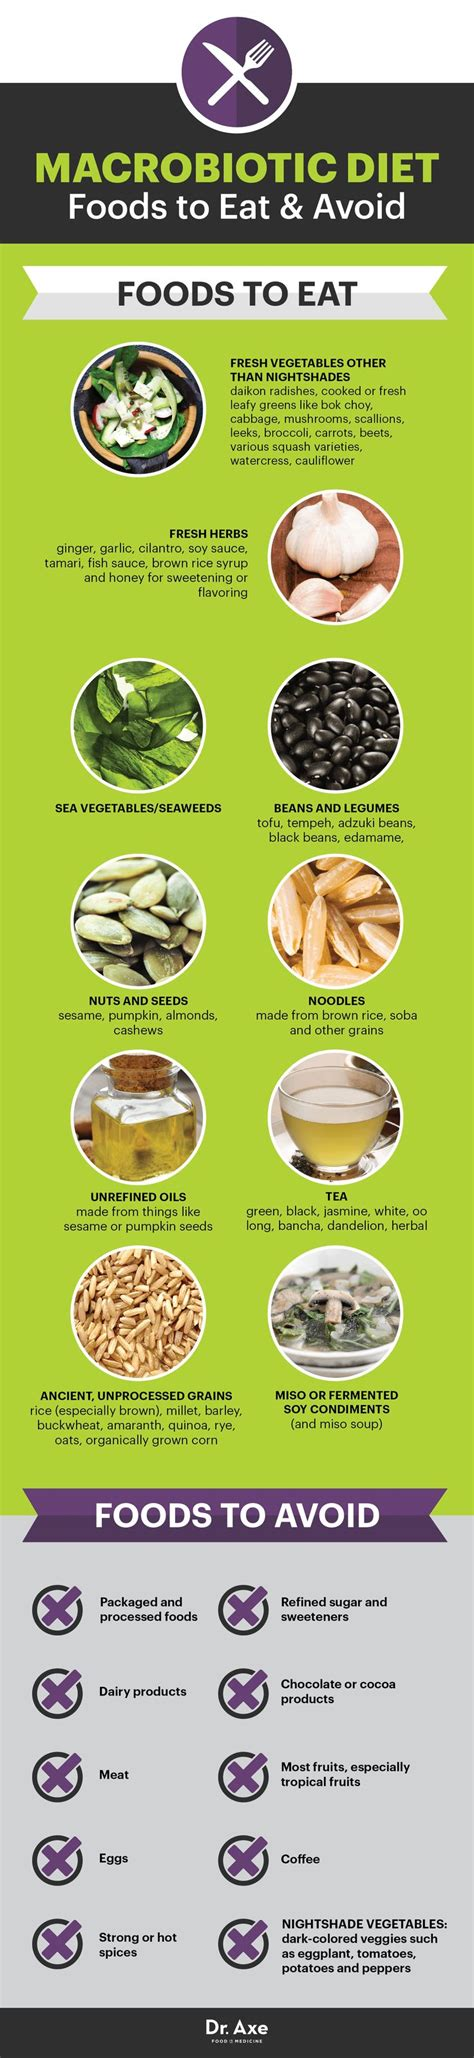 Macrobiotic Liver Detox 78 best ideas about macrobiotic diet on